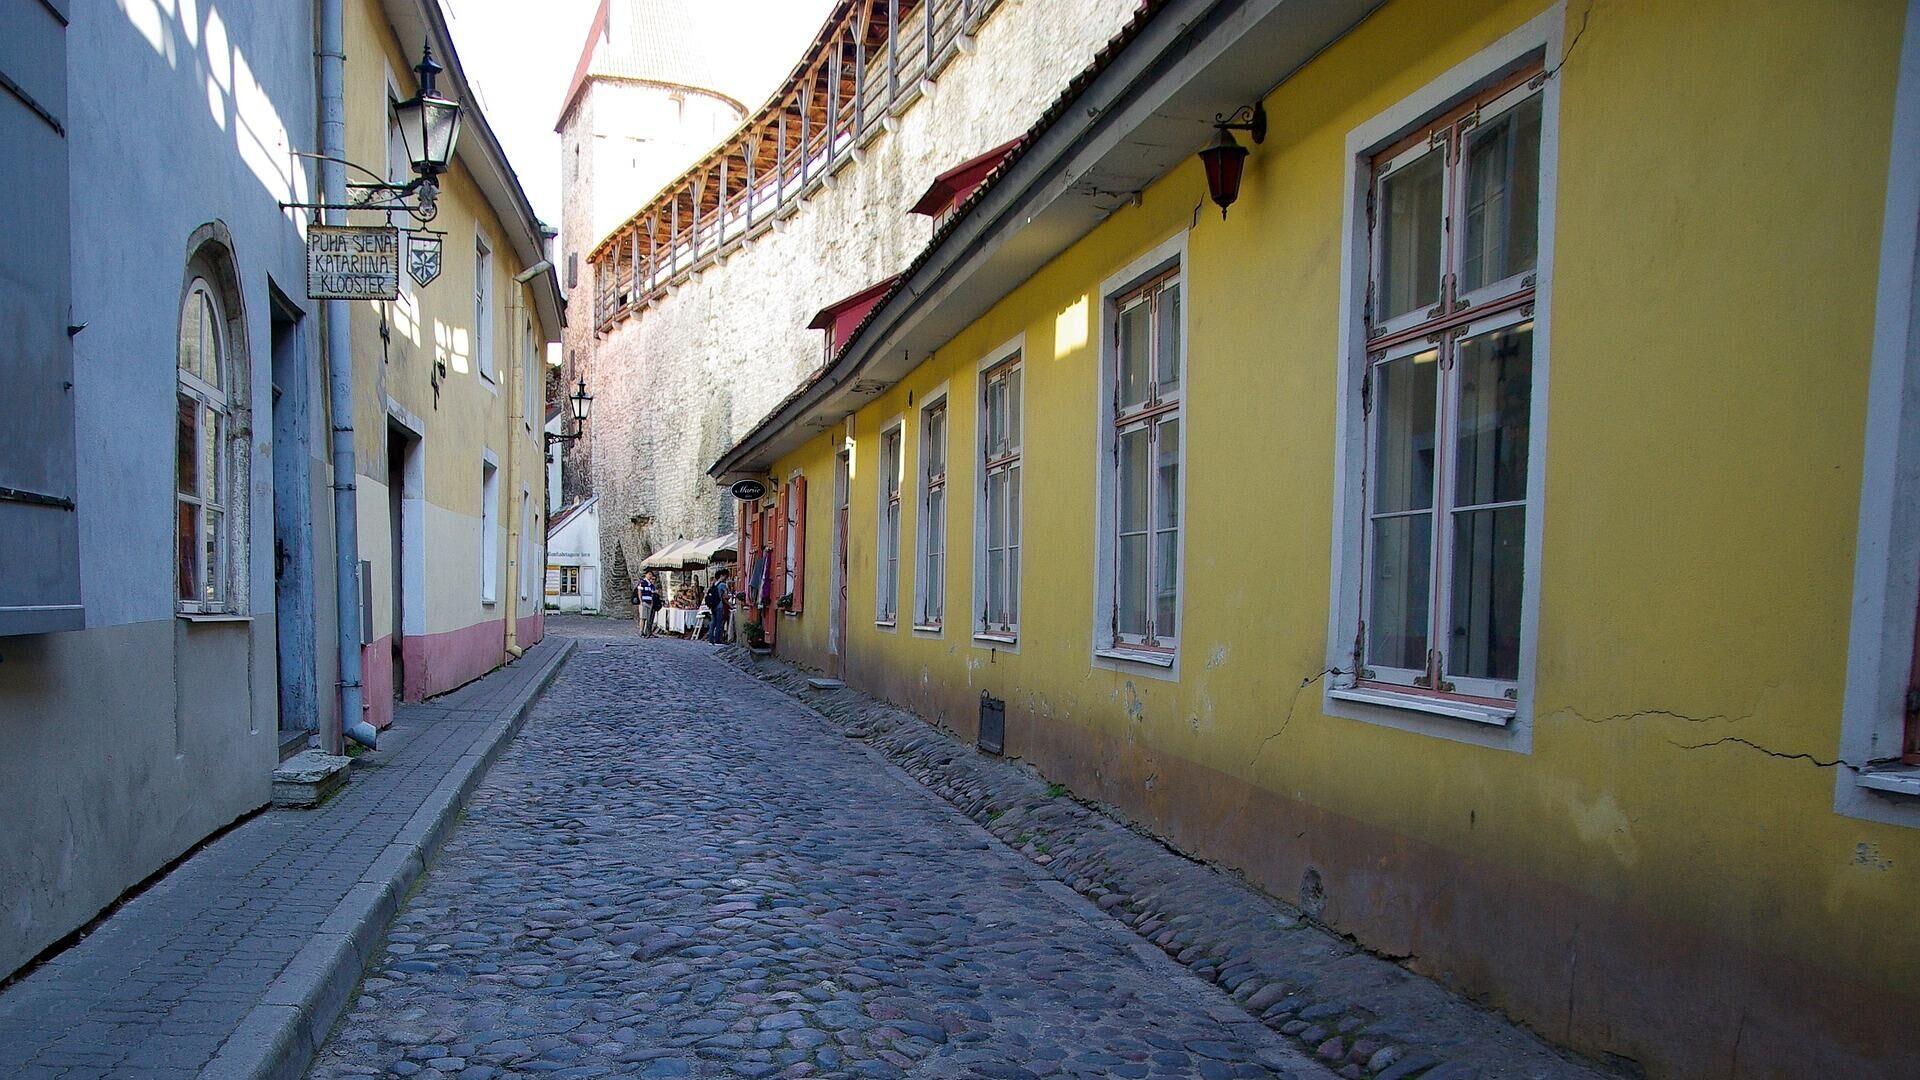 Улочка в старом городе Таллина - РИА Новости, 1920, 12.03.2021